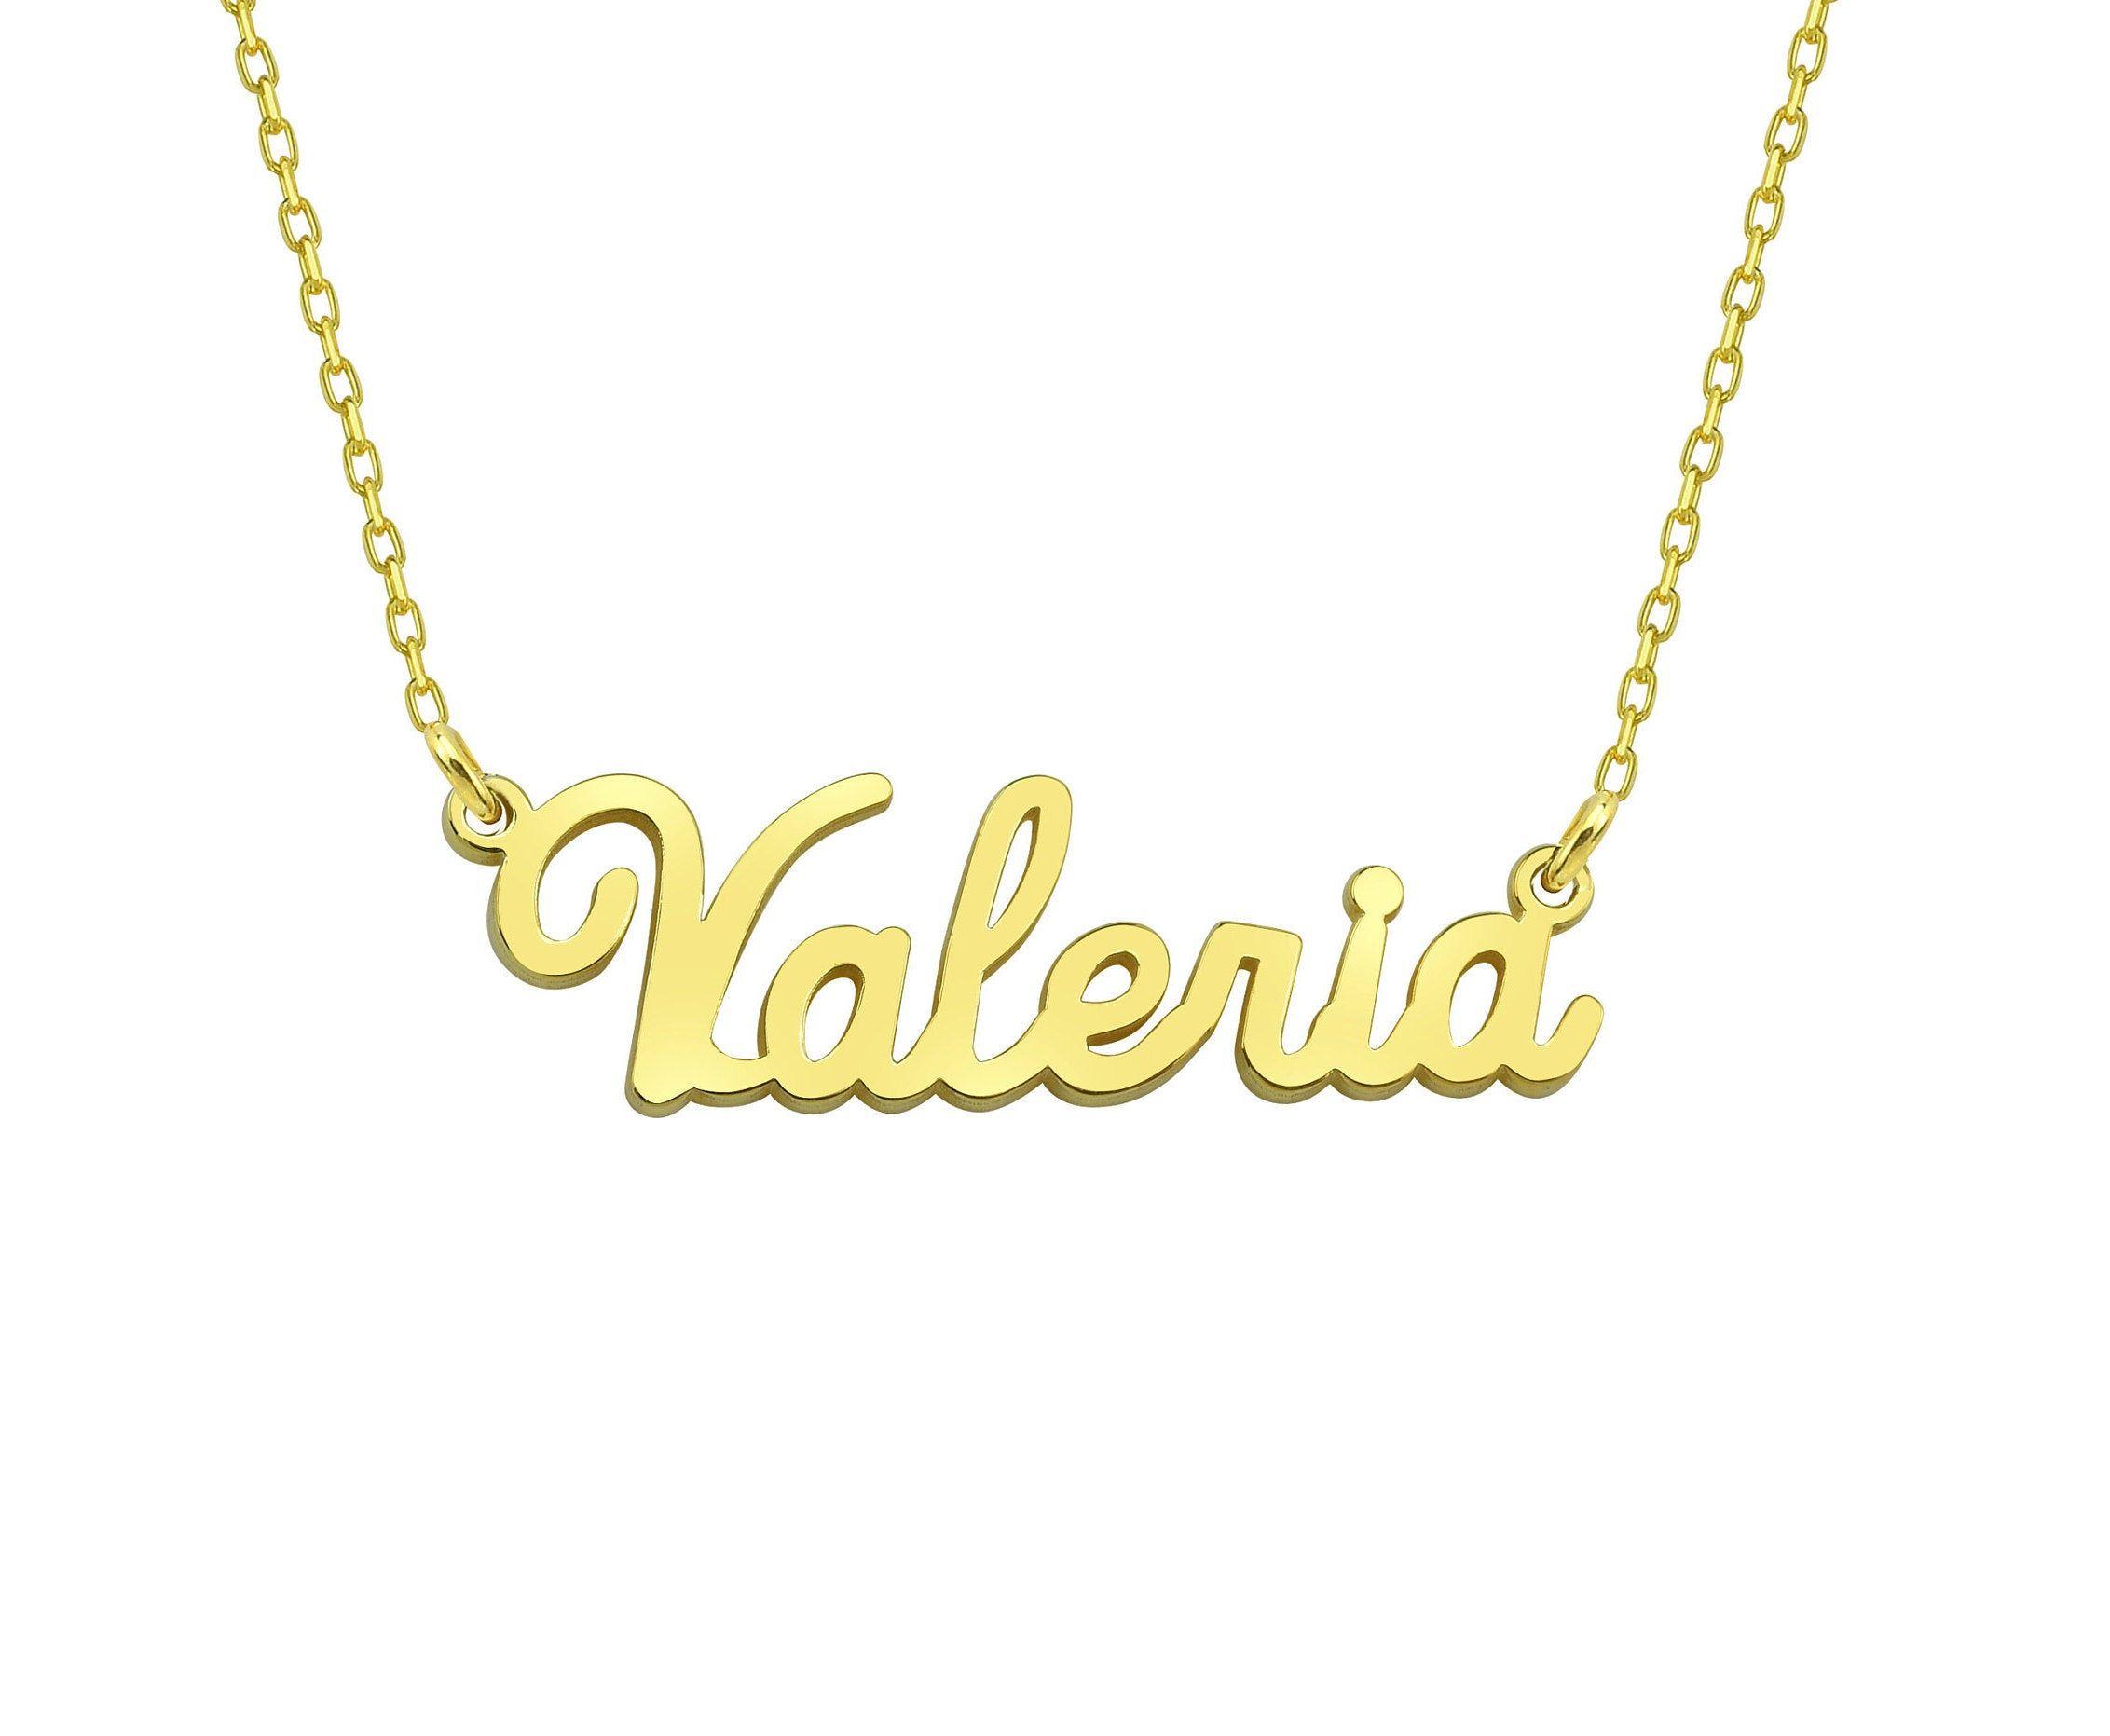 Custom Name Necklace, Personalized Jewelry, Personalized Gift, Gift For Her, Name Necklace, Danity Necklace